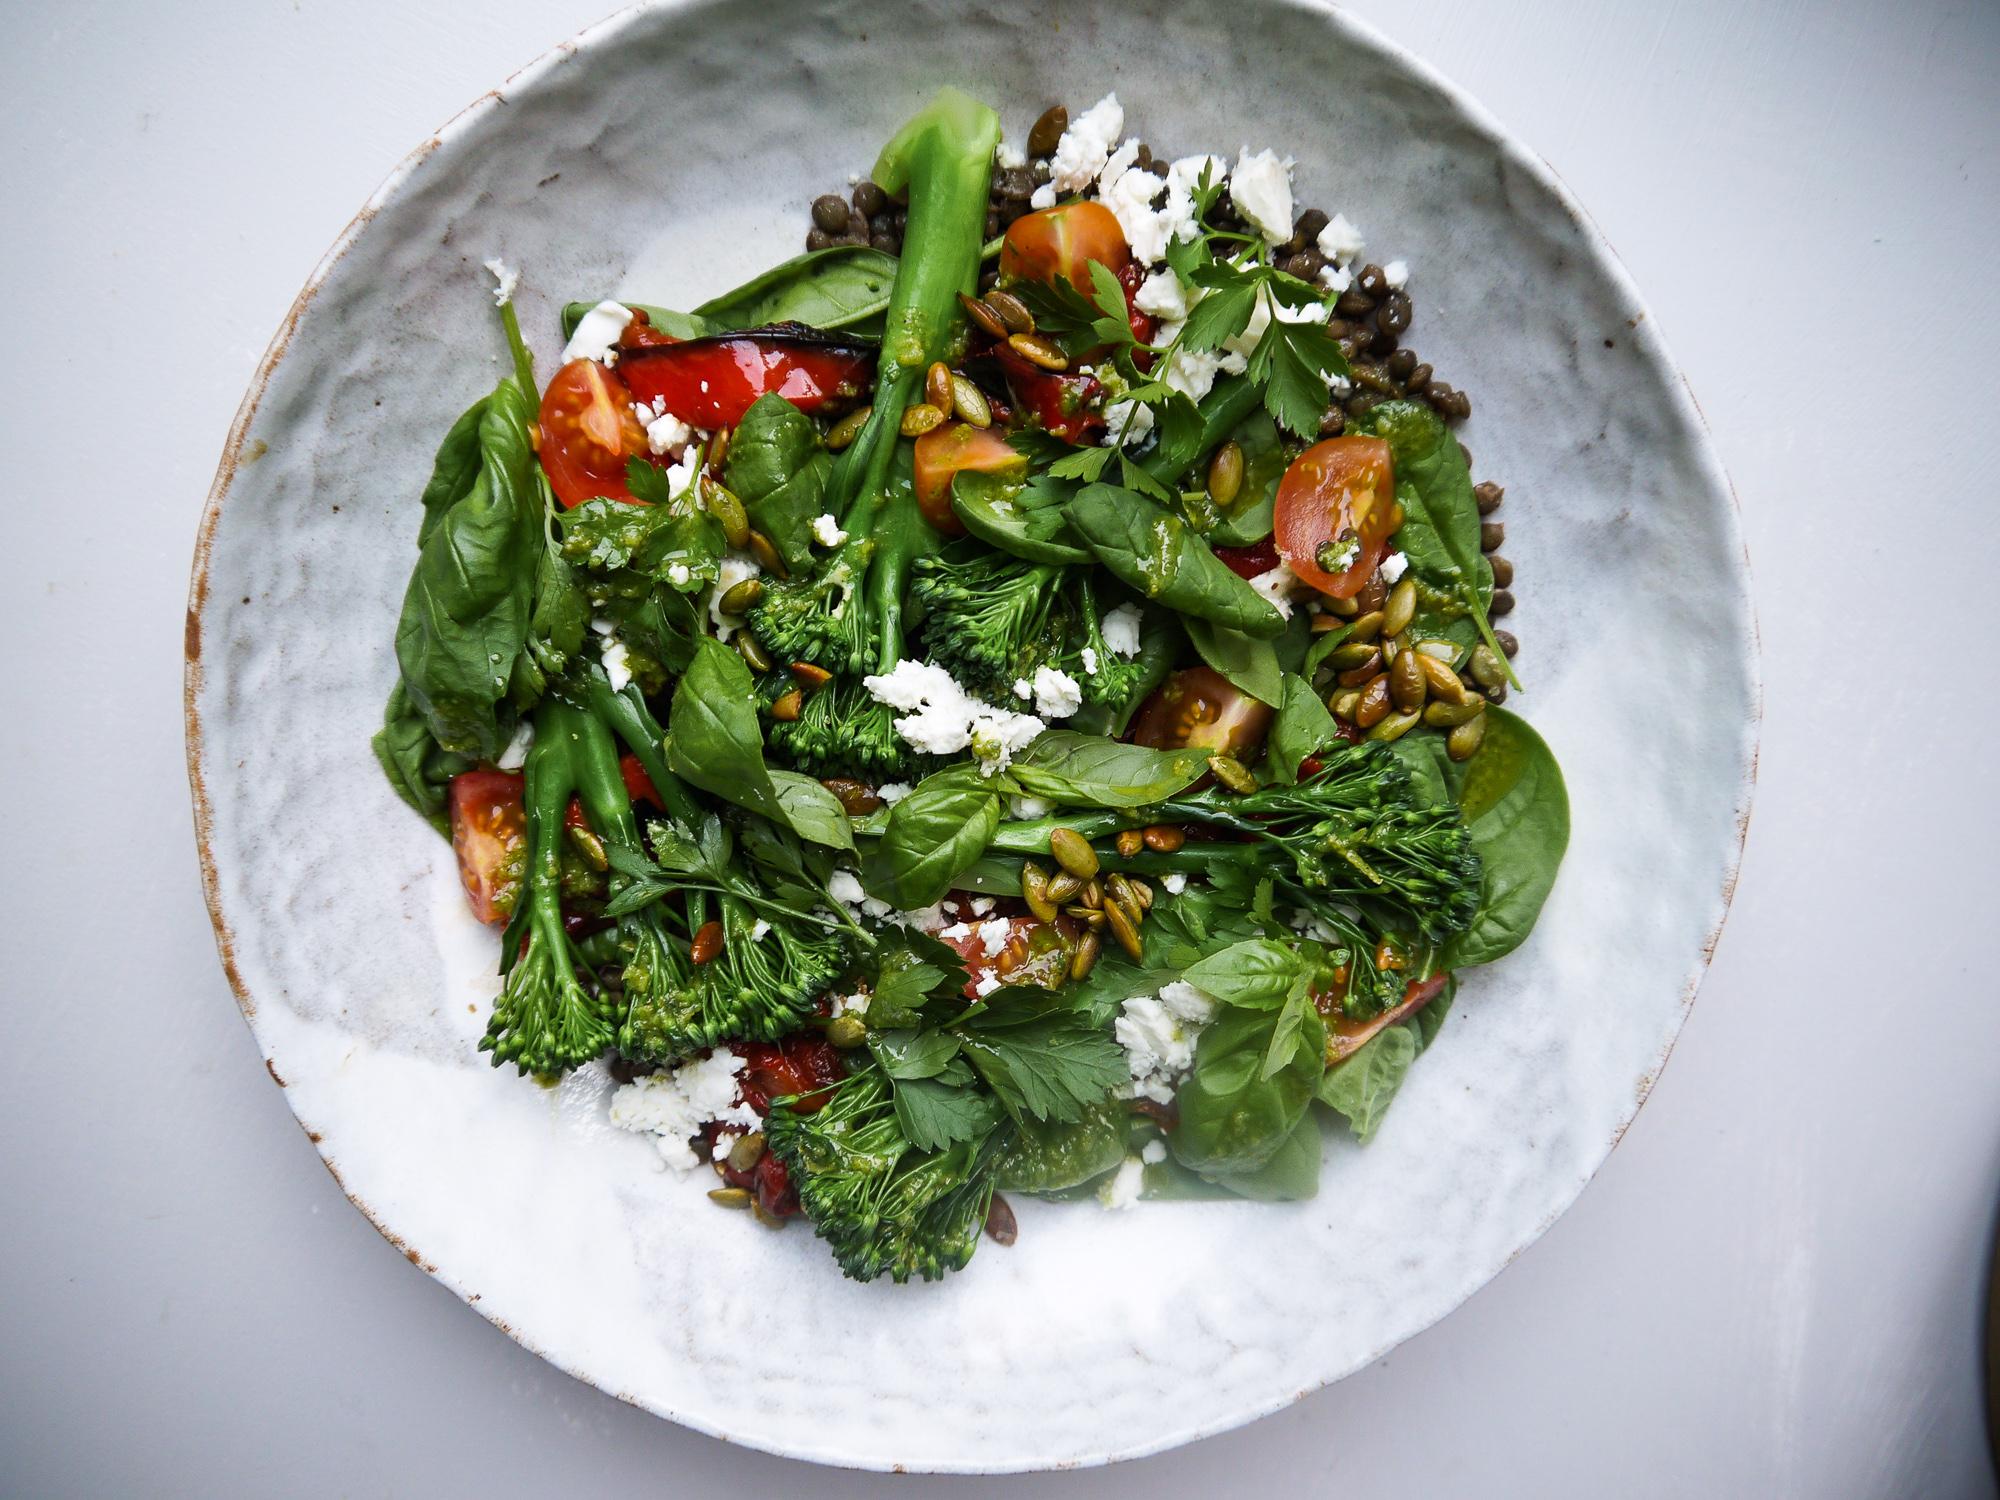 lentil & avocado platter (vegan, gf) £37.50 - (individual bowl pictured)puy lentils, roast red peppers, feta, avocado, cherry tomatoes, spicy broccoli, shredded carrots & beets, basil, seeds, rocket, chopped romaine, balsamic vinaigretteadd hummus +£7.50